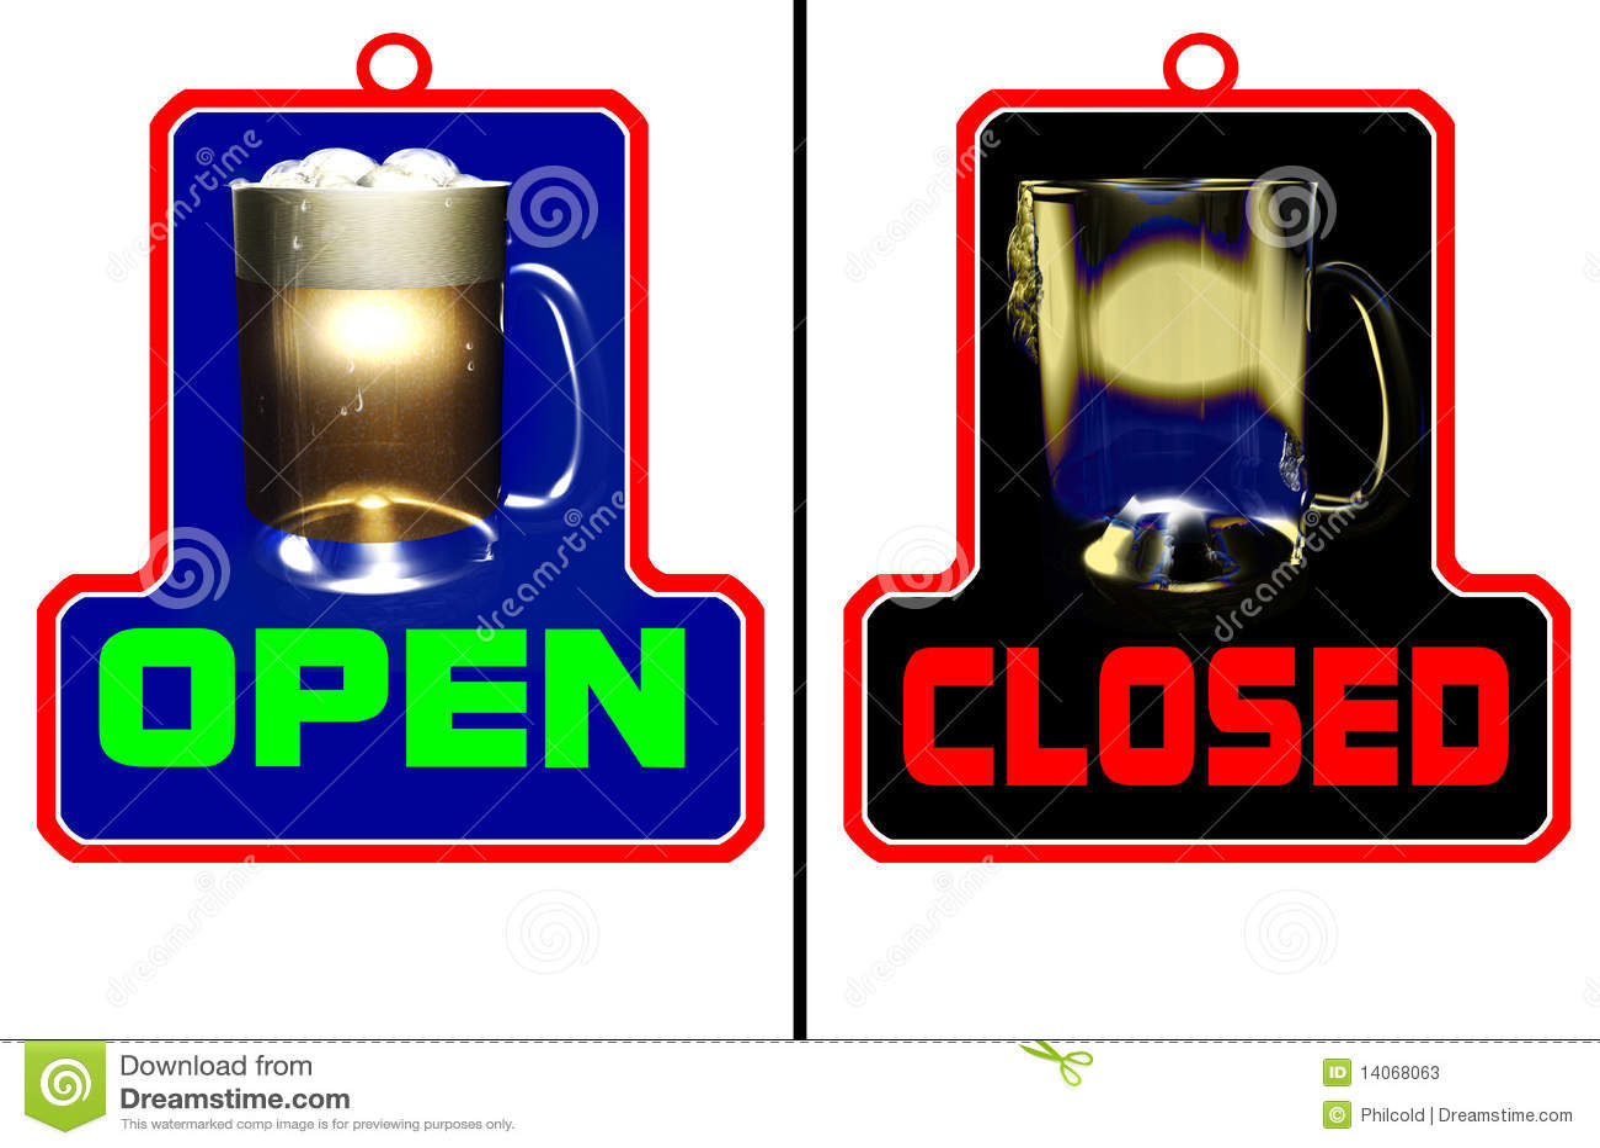 Bar Open Bar Closed Stock Photos - Image: 14068063